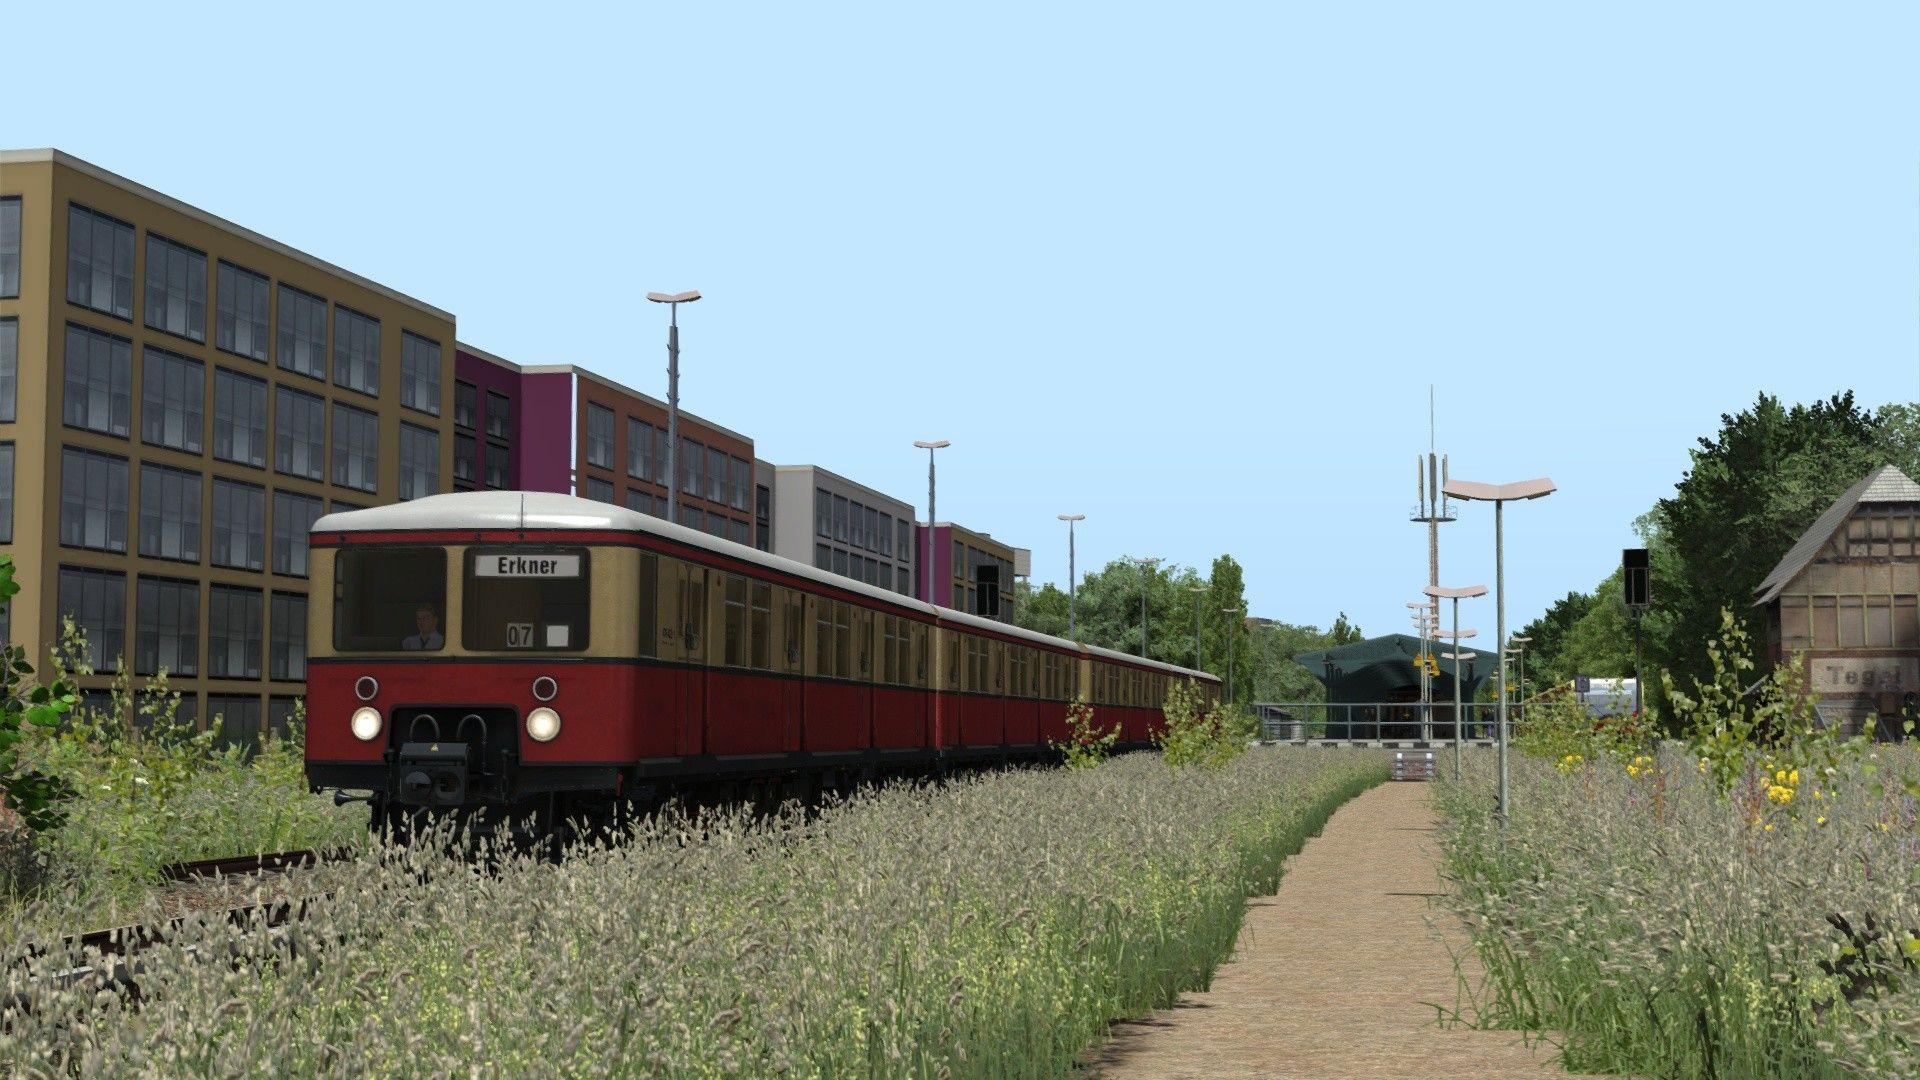 Train Simulator S25 Heart of Berlin: Hennigsdorf to Teltow